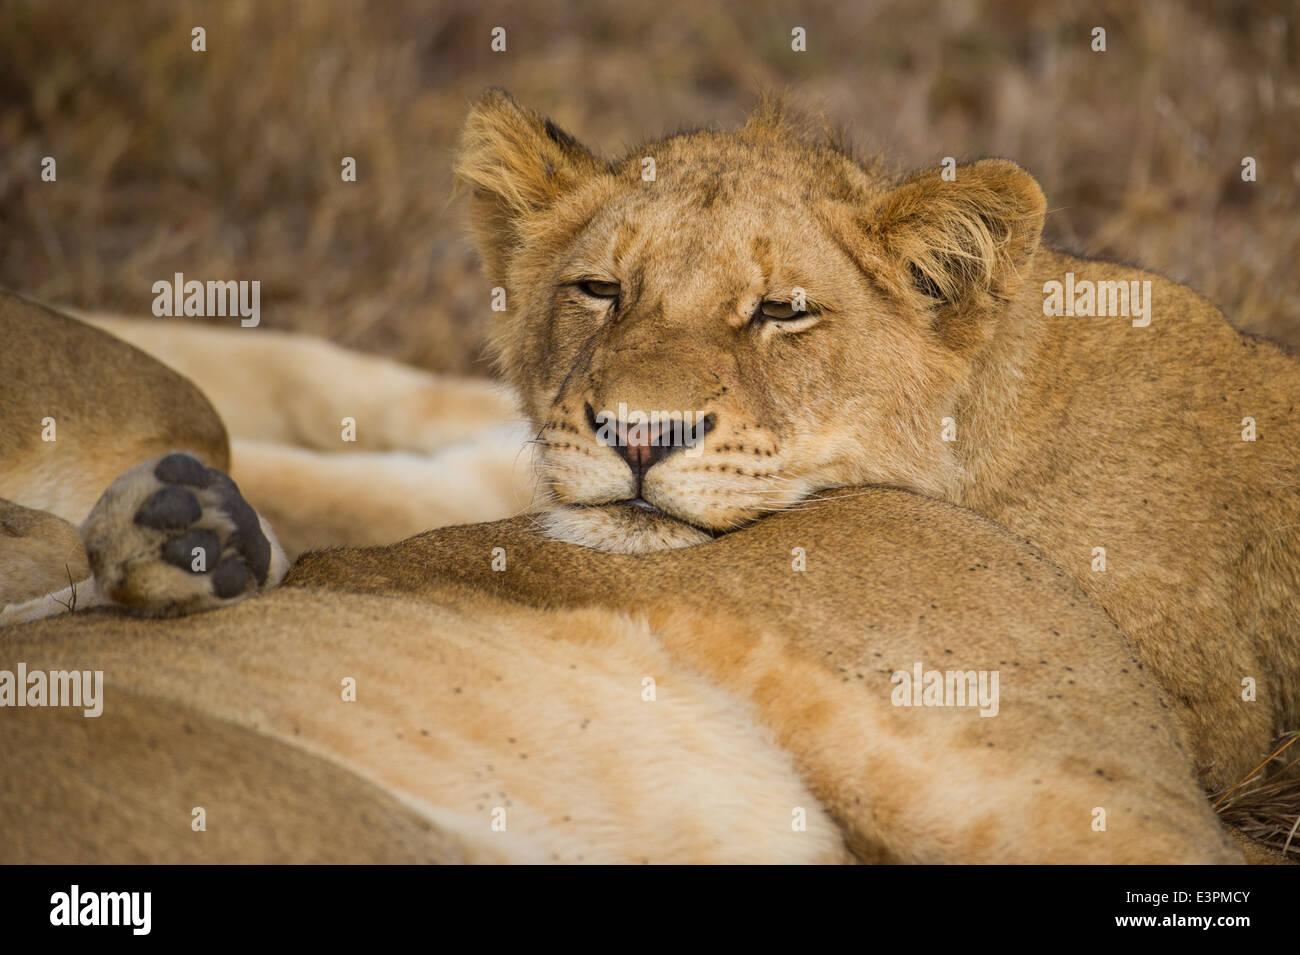 lion cubs sleeping photos lion cubs sleeping images alamy. Black Bedroom Furniture Sets. Home Design Ideas